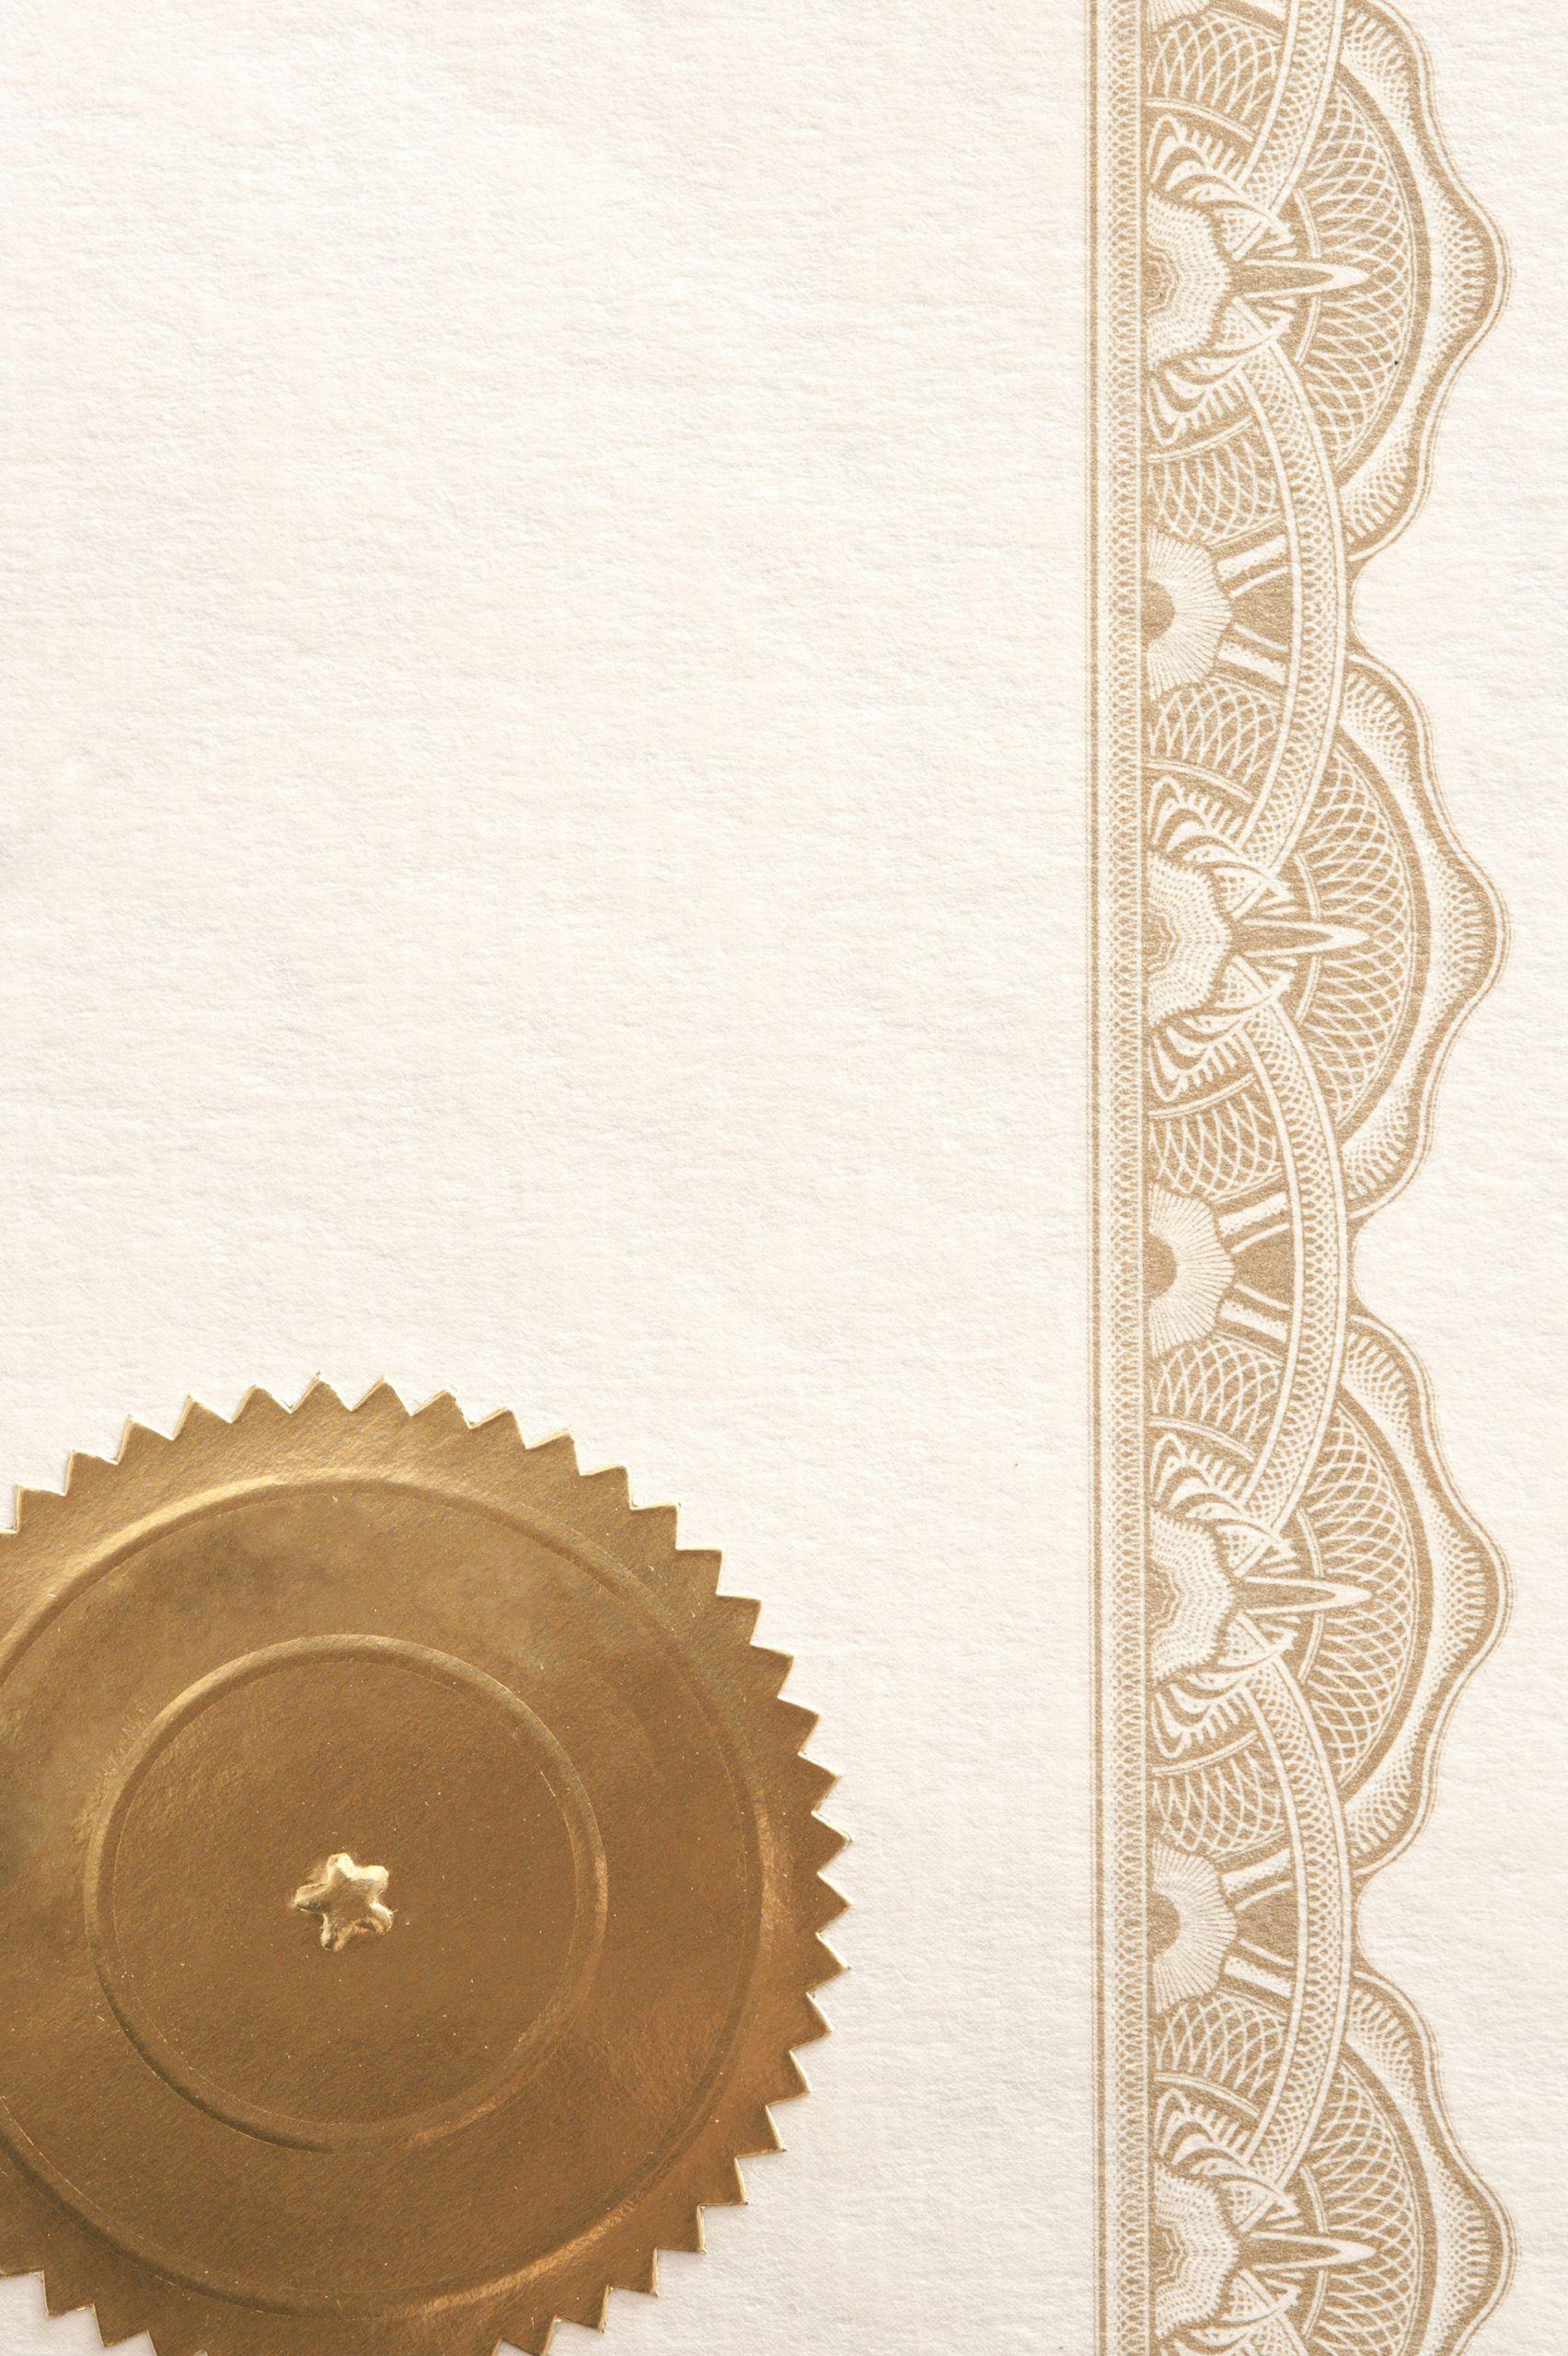 Gold Border Certificate Paper Luxury Certificate Paper Frame